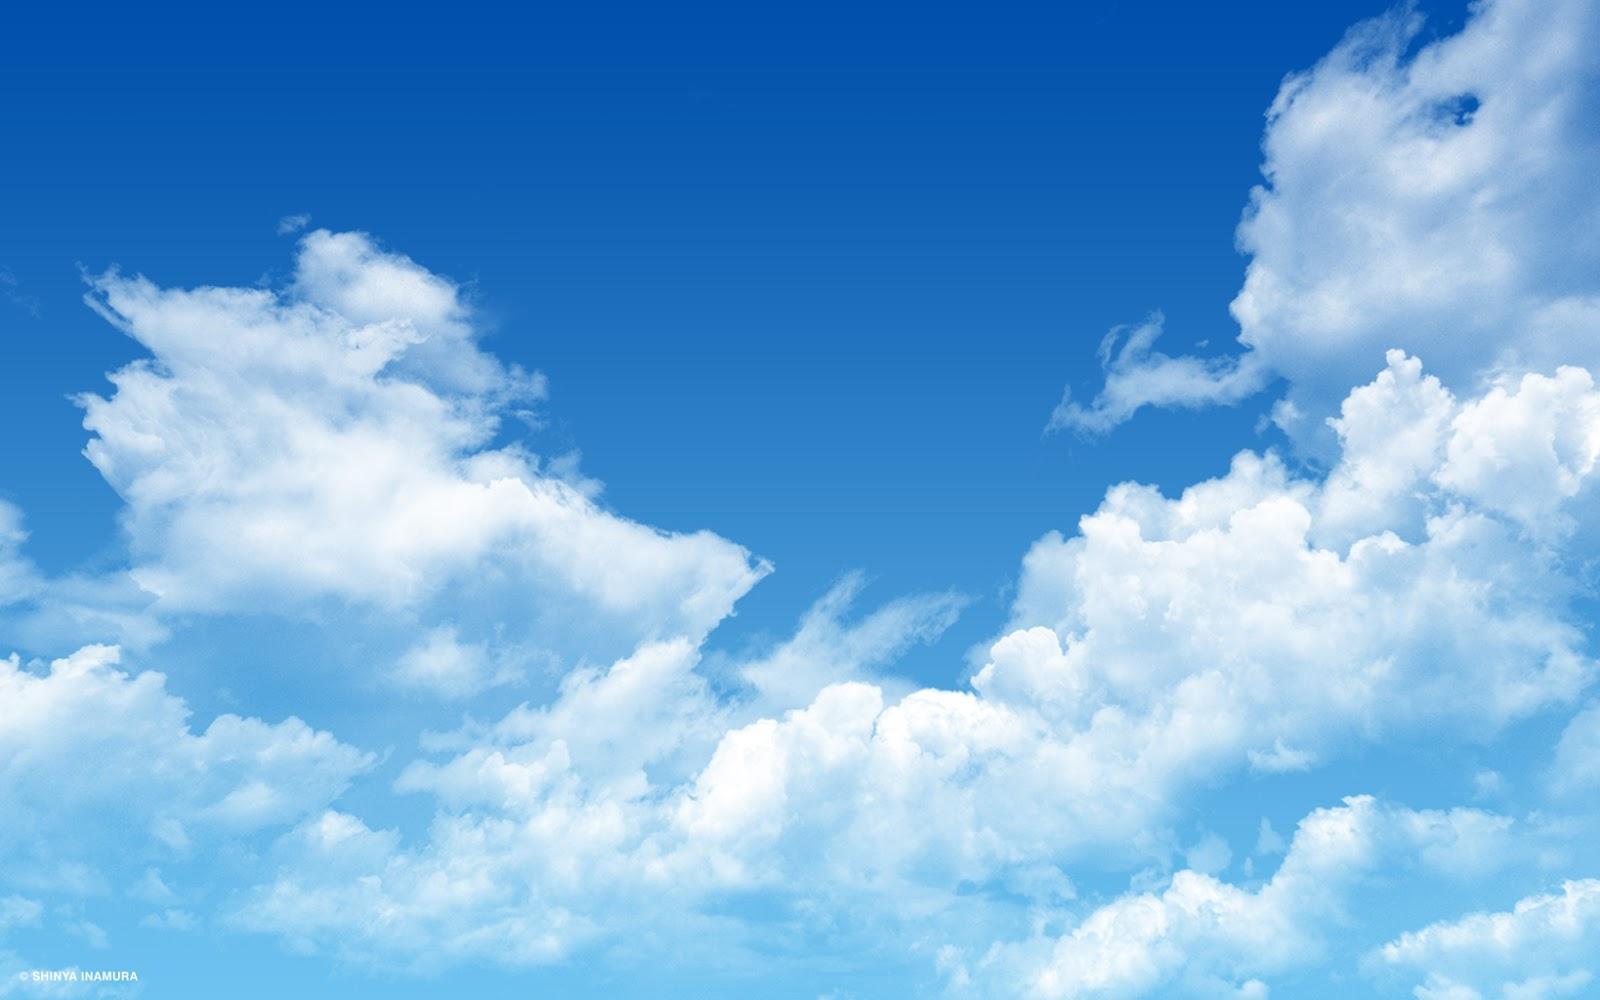 Blue Sky Wallpaper For Desktop Computer Wall2U 1600x1000